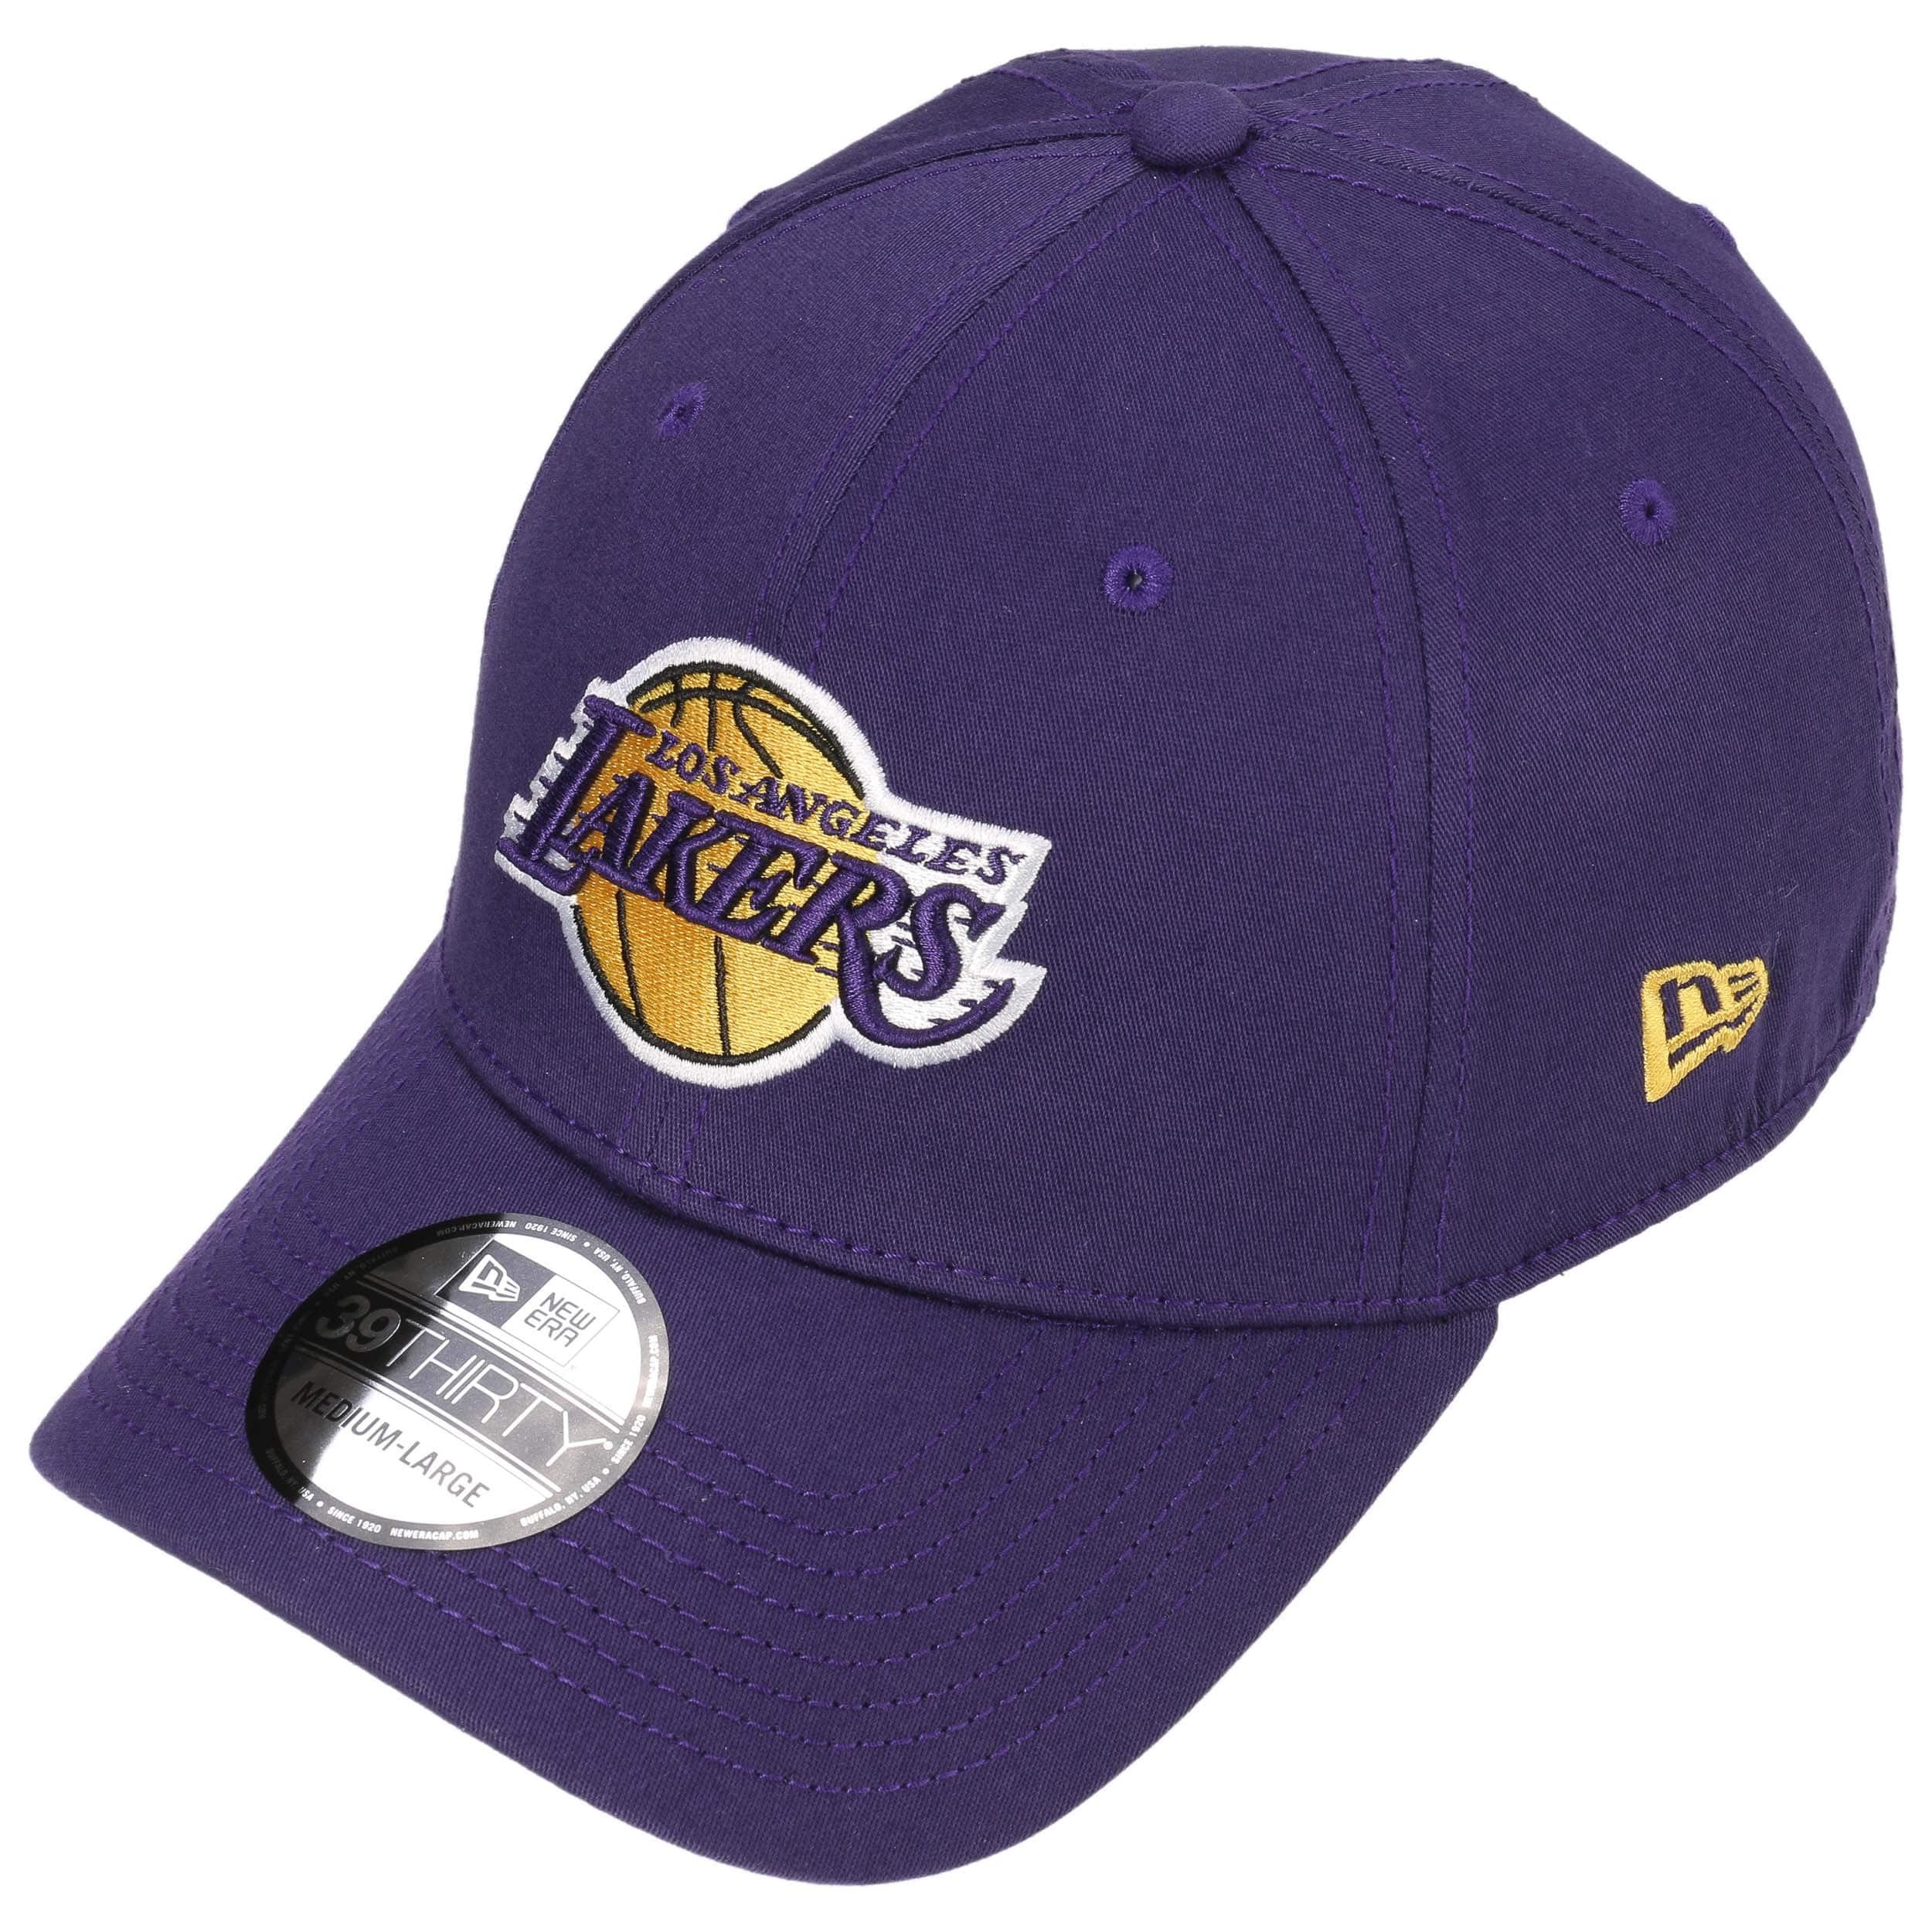 Cappellino 39Thirty LA Lakers by New Era - lilla 1 ... 192d2a9ddaaa